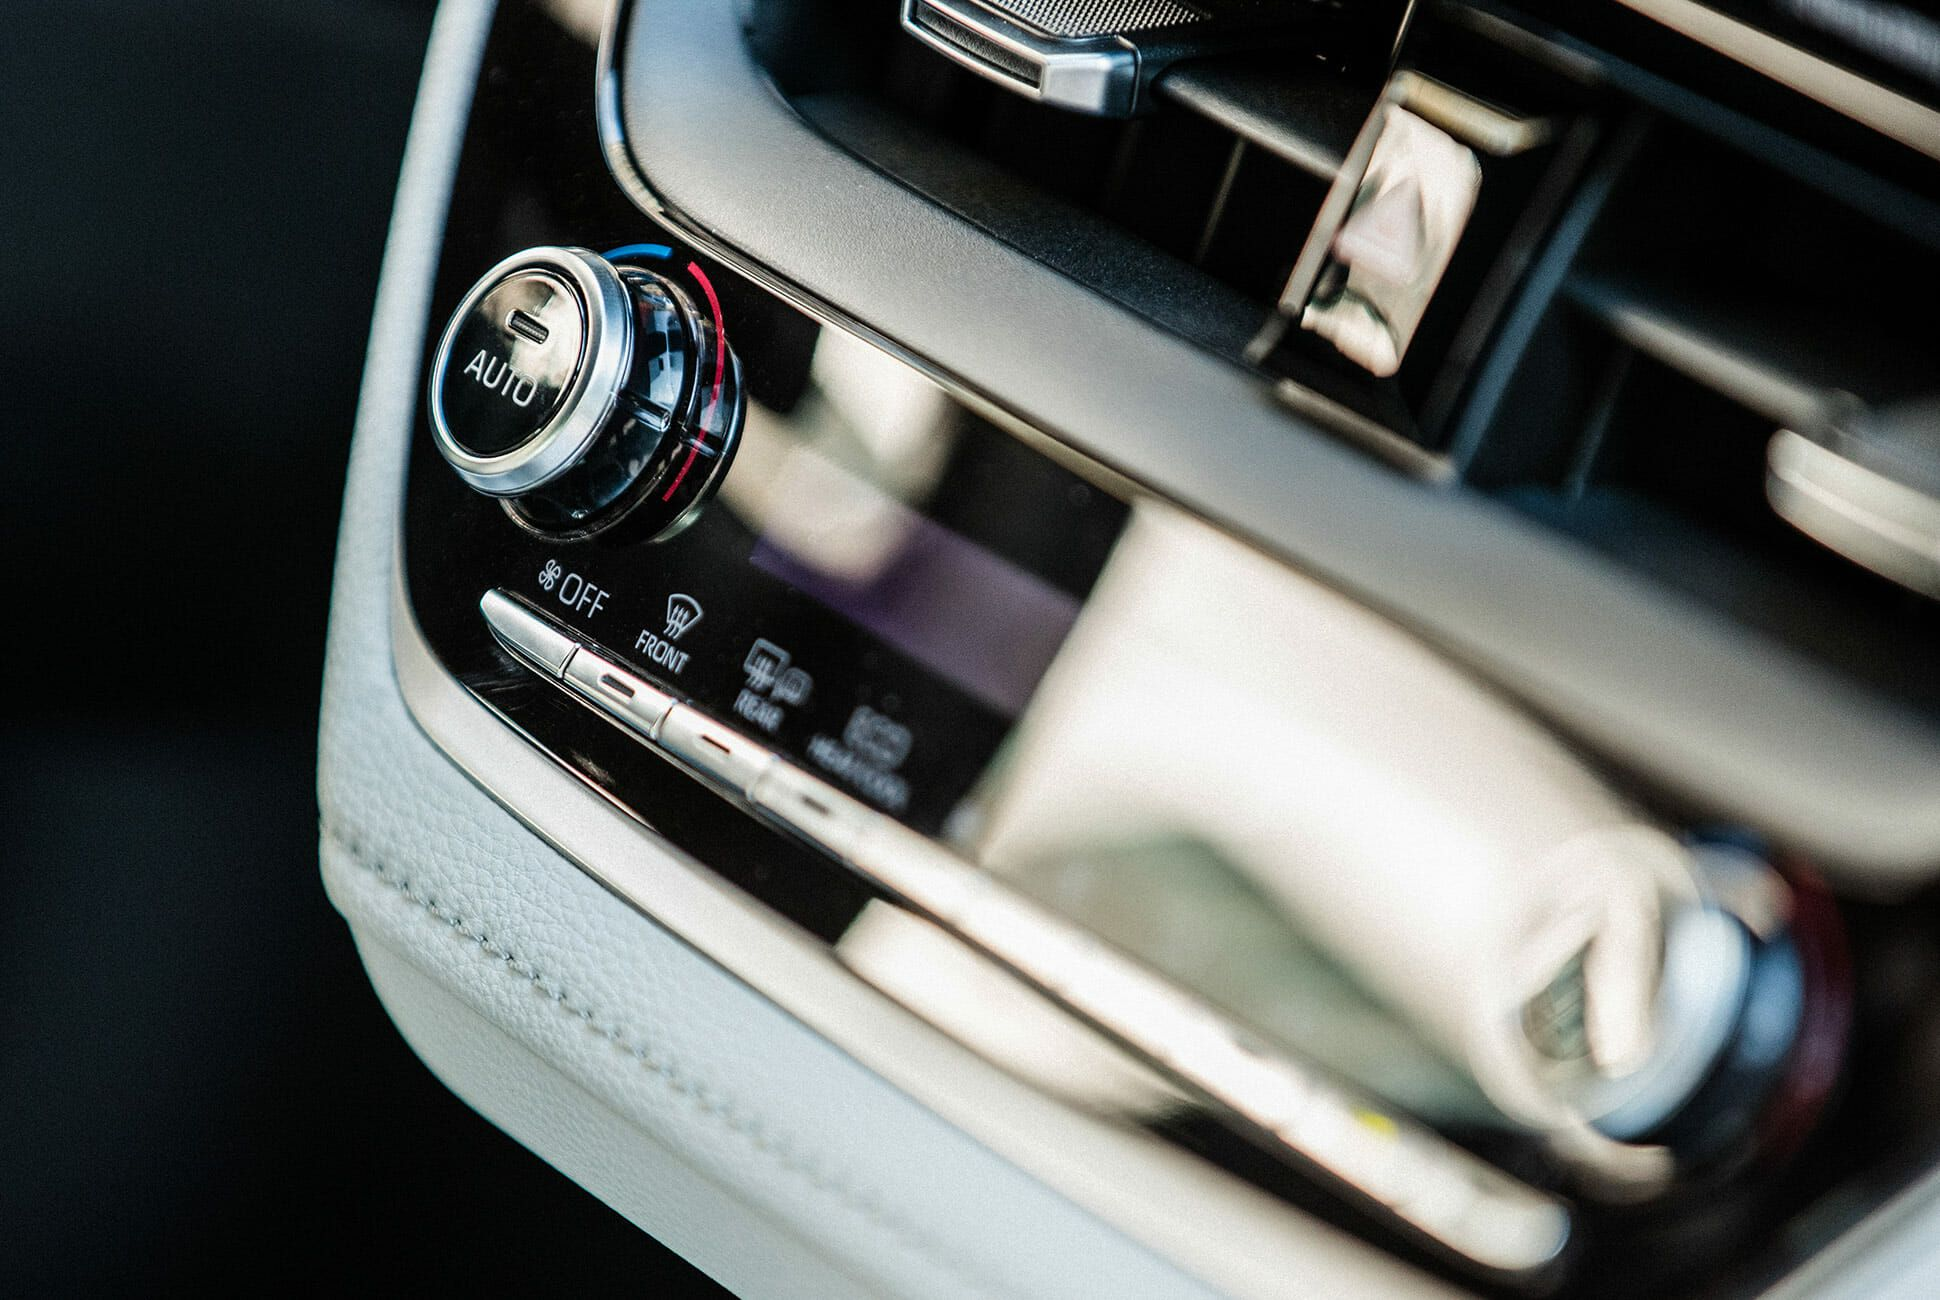 Toyota-Corolla-XSE-Hatch-Review-gear-patrol-slide-13